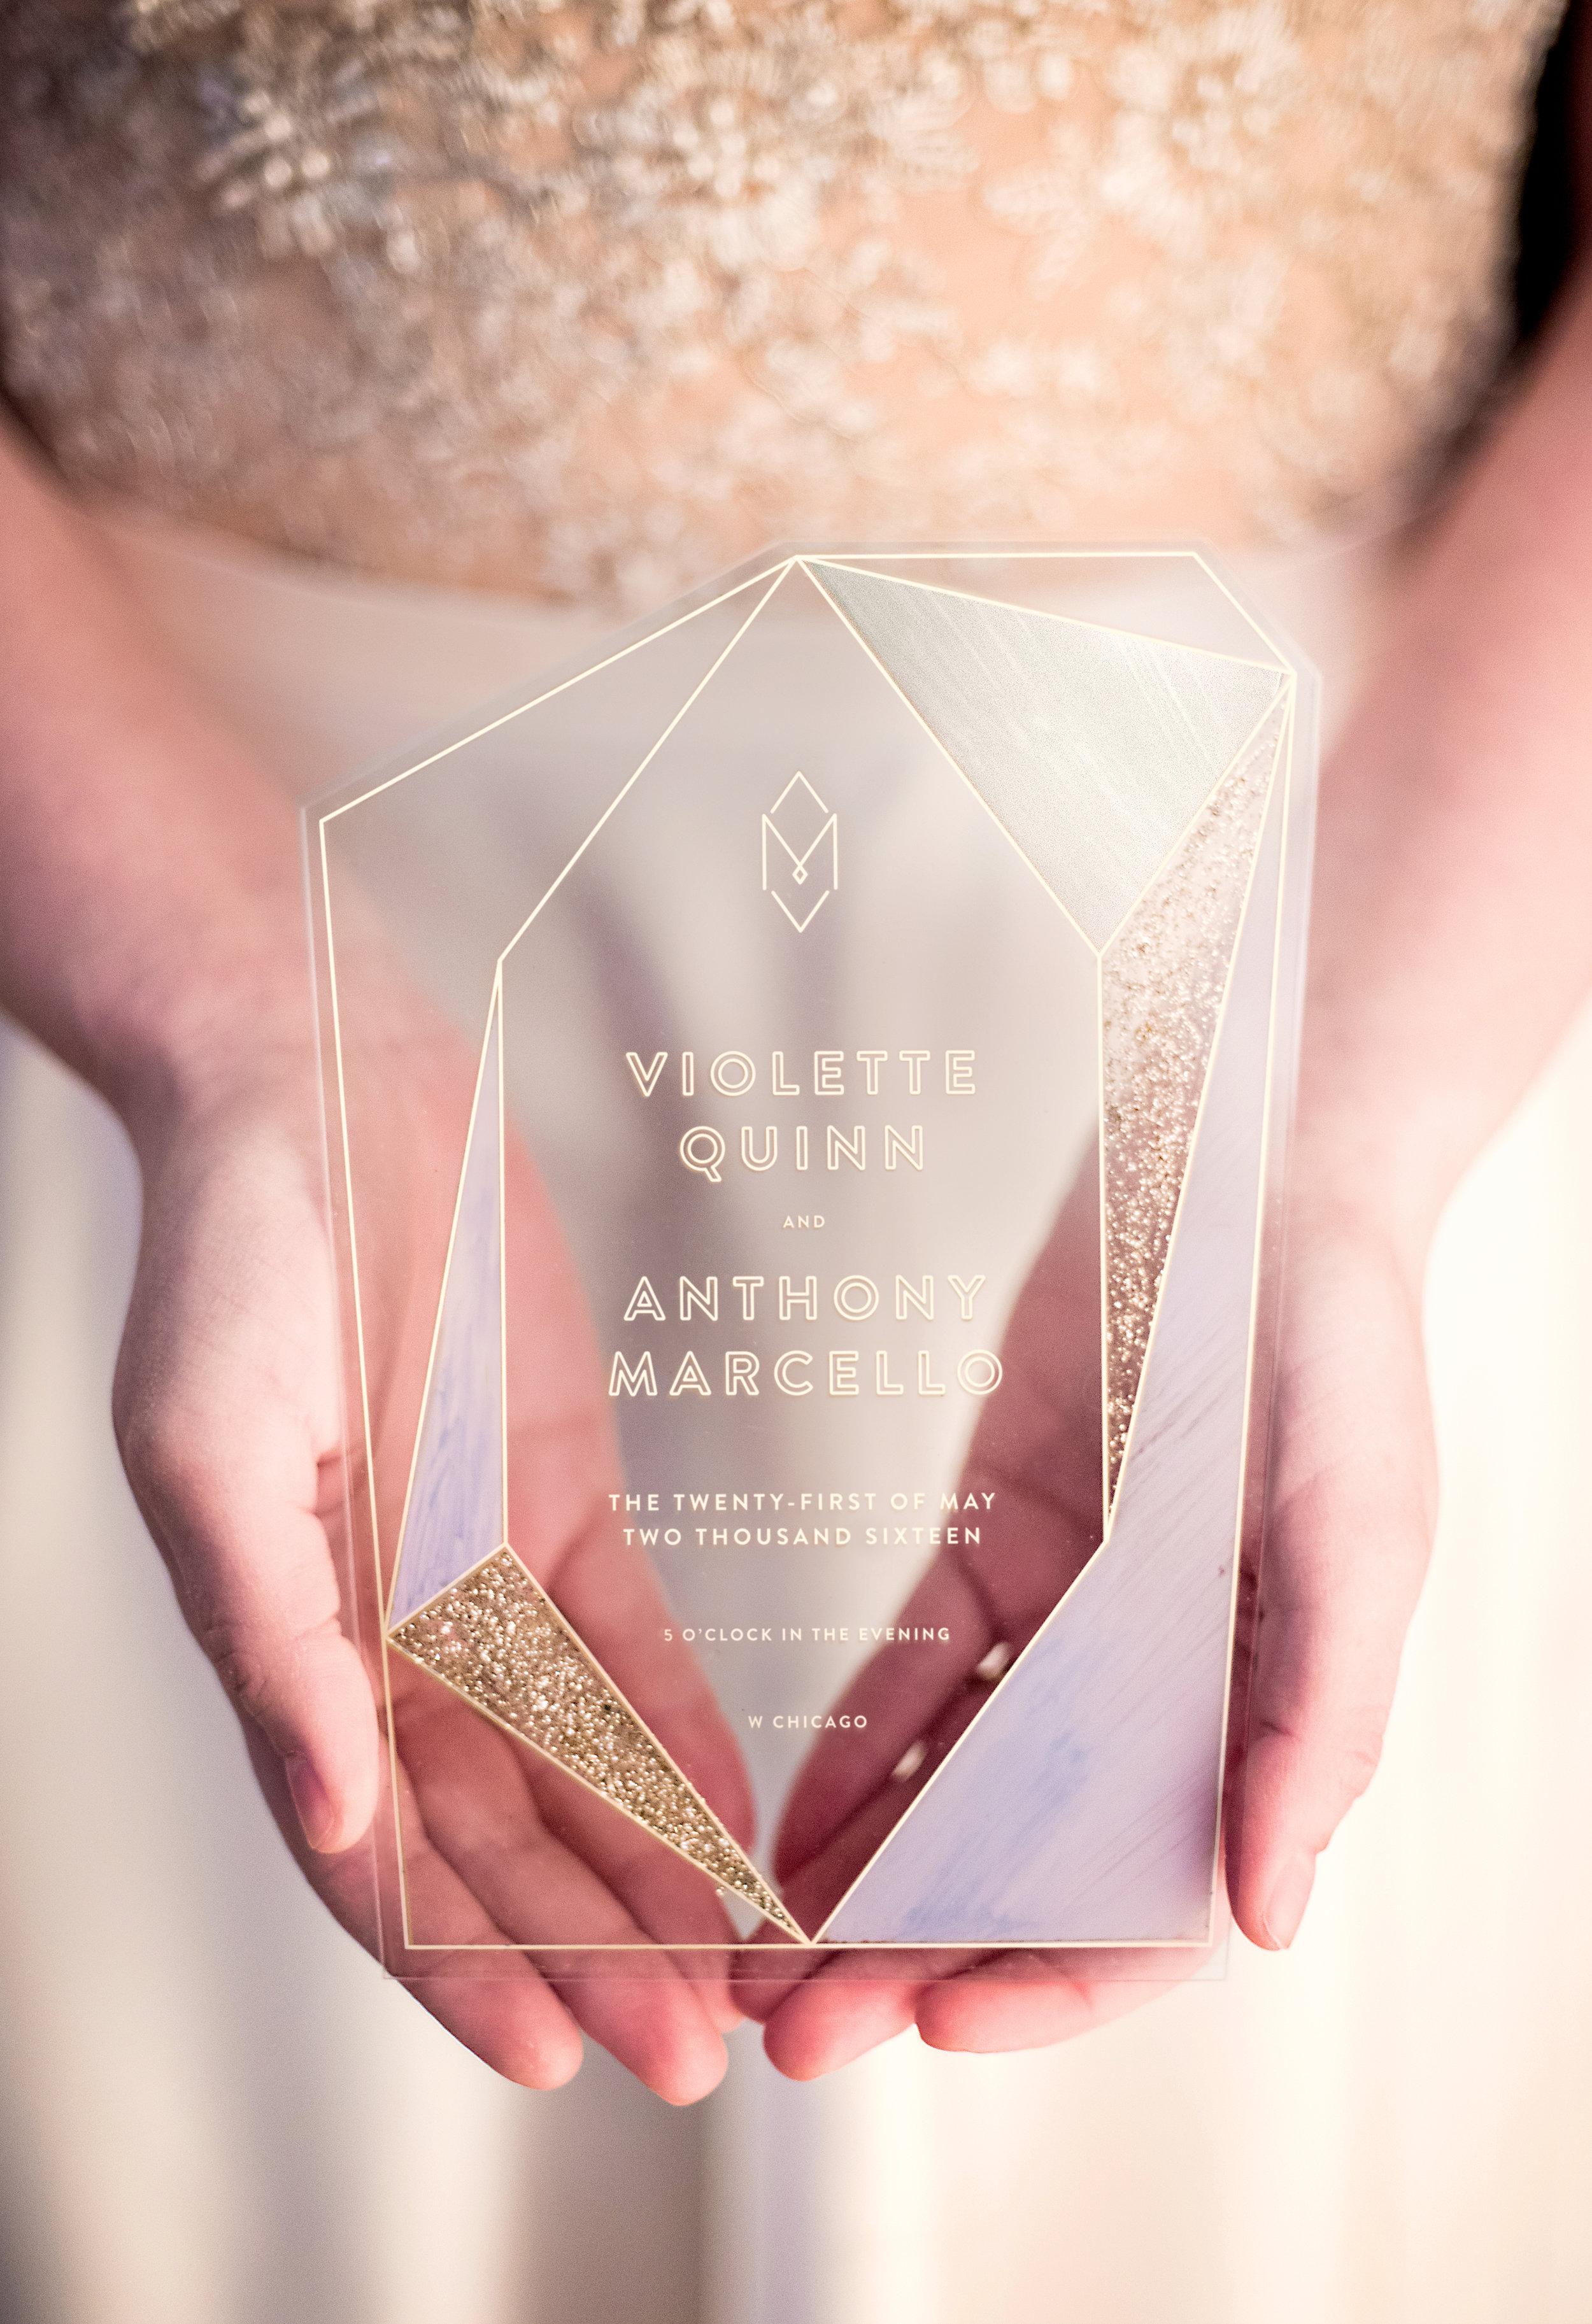 Photography    Gerber Scarpelli Weddings    | Planning    Clover Events    | Event Design & Stationery    Sugar & Gold